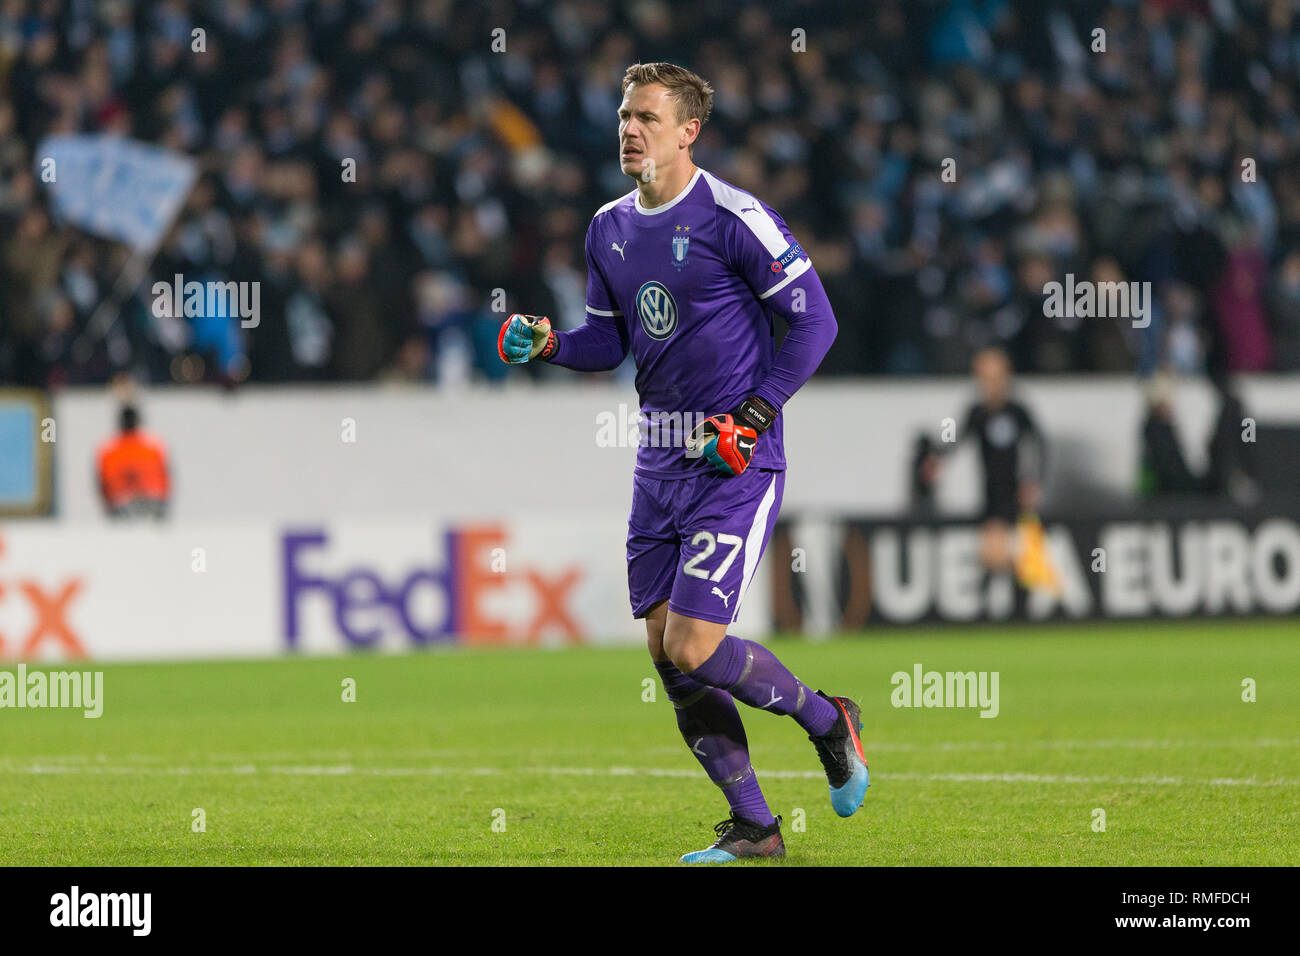 535ae278b5a33c Sweden Goalkeeper Stock Photos   Sweden Goalkeeper Stock Images - Alamy